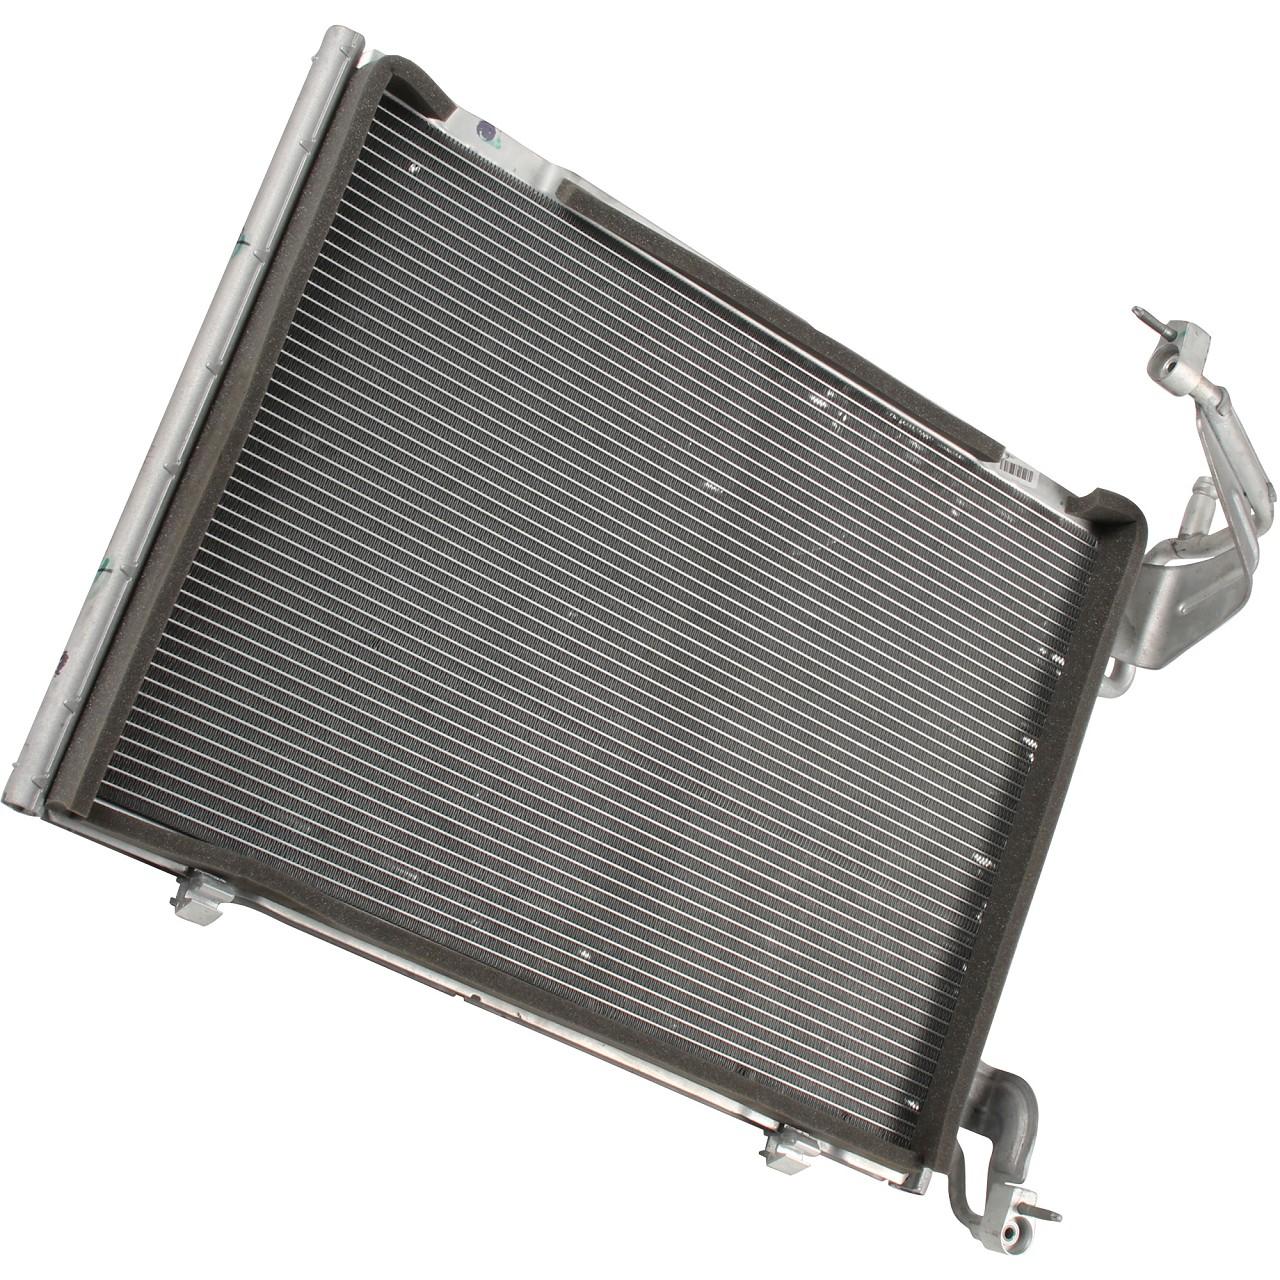 ORIGINAL Ford Kondensator Klimakondensator ECOSPORT ab 10.2013 2027610